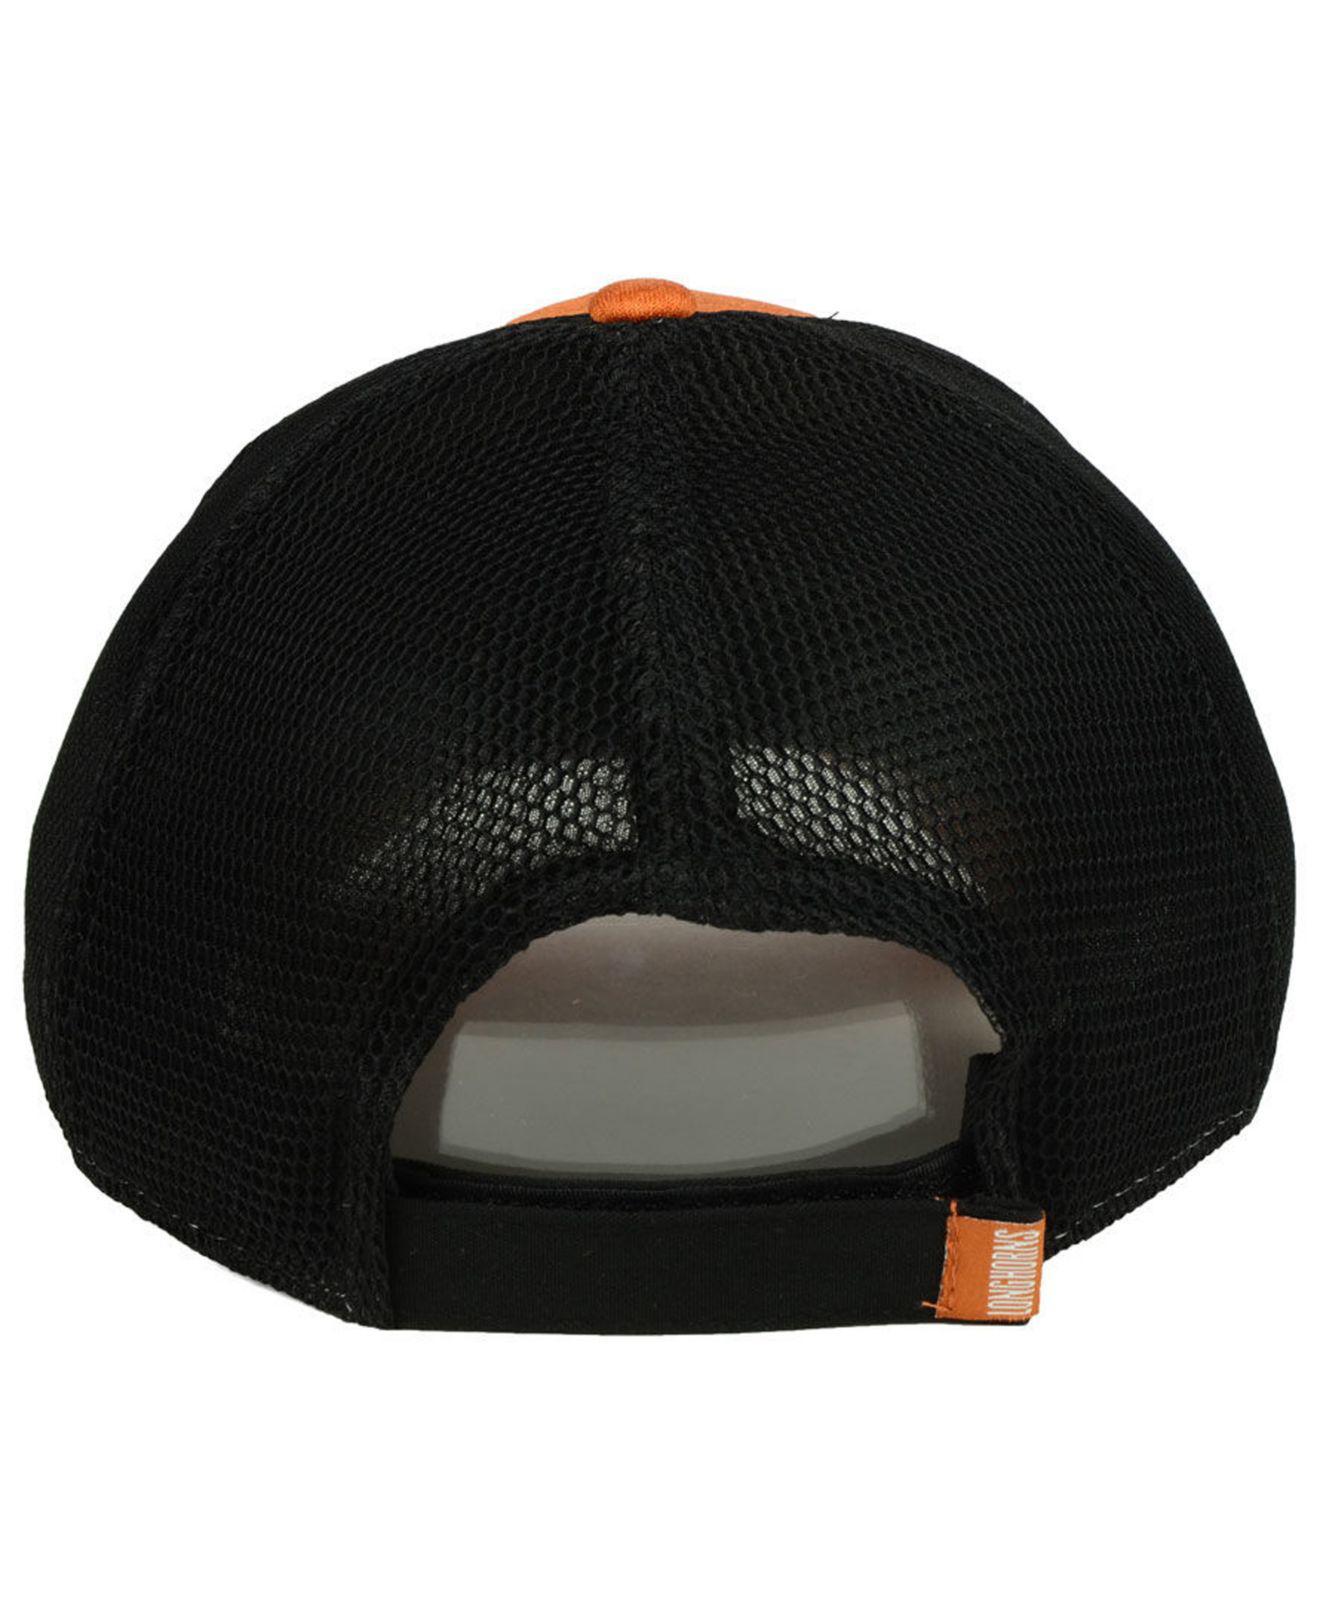 newest d39ba 545e0 ... sale texas longhorns tech trim 9forty cap for men lyst. view fullscreen  06798 68a6d